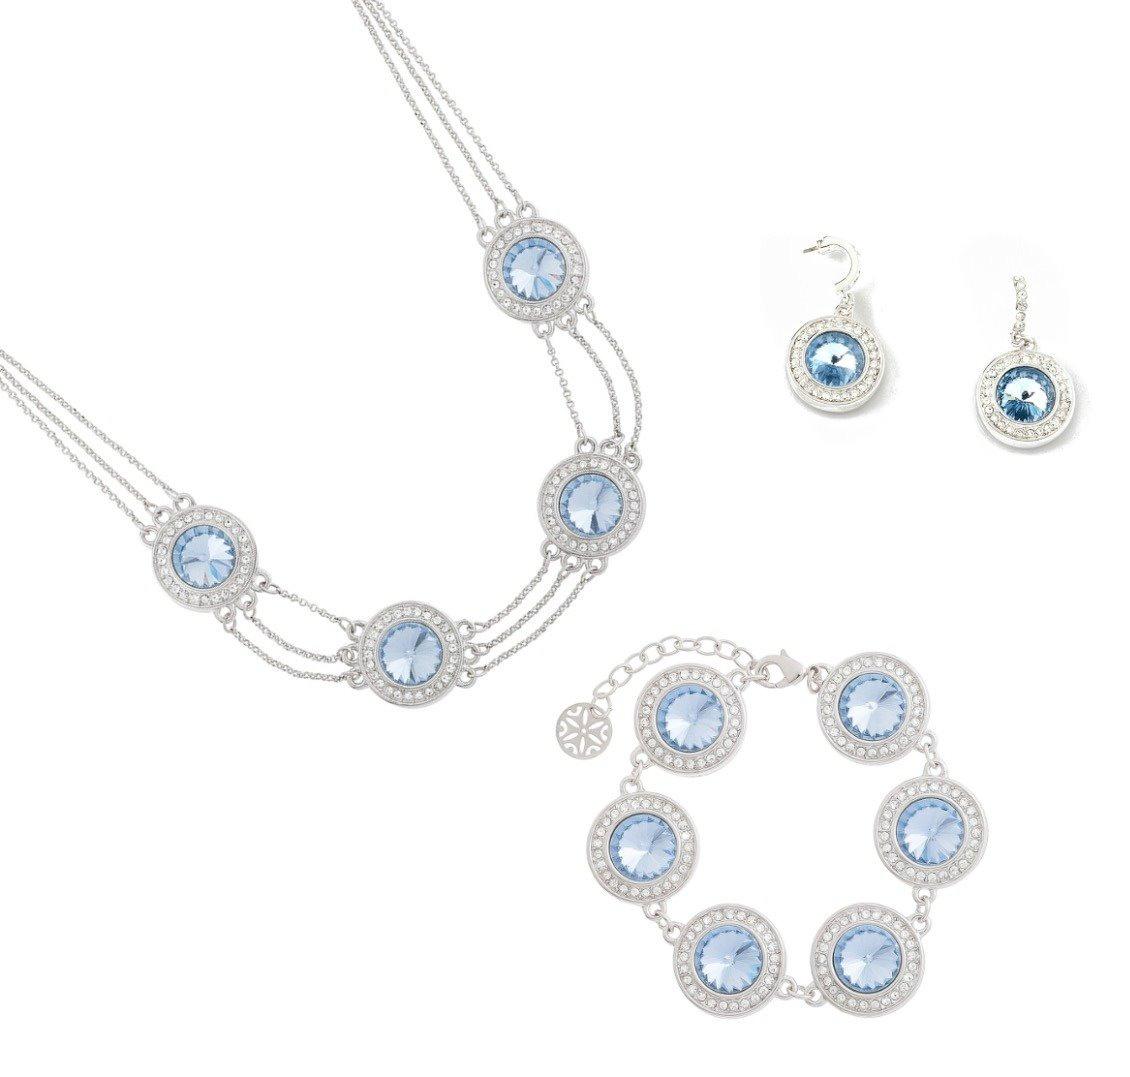 27bb2f03b318 Nice Collar Cristal Azul+pulsera+aretes Baño Rodio Con Envio ...